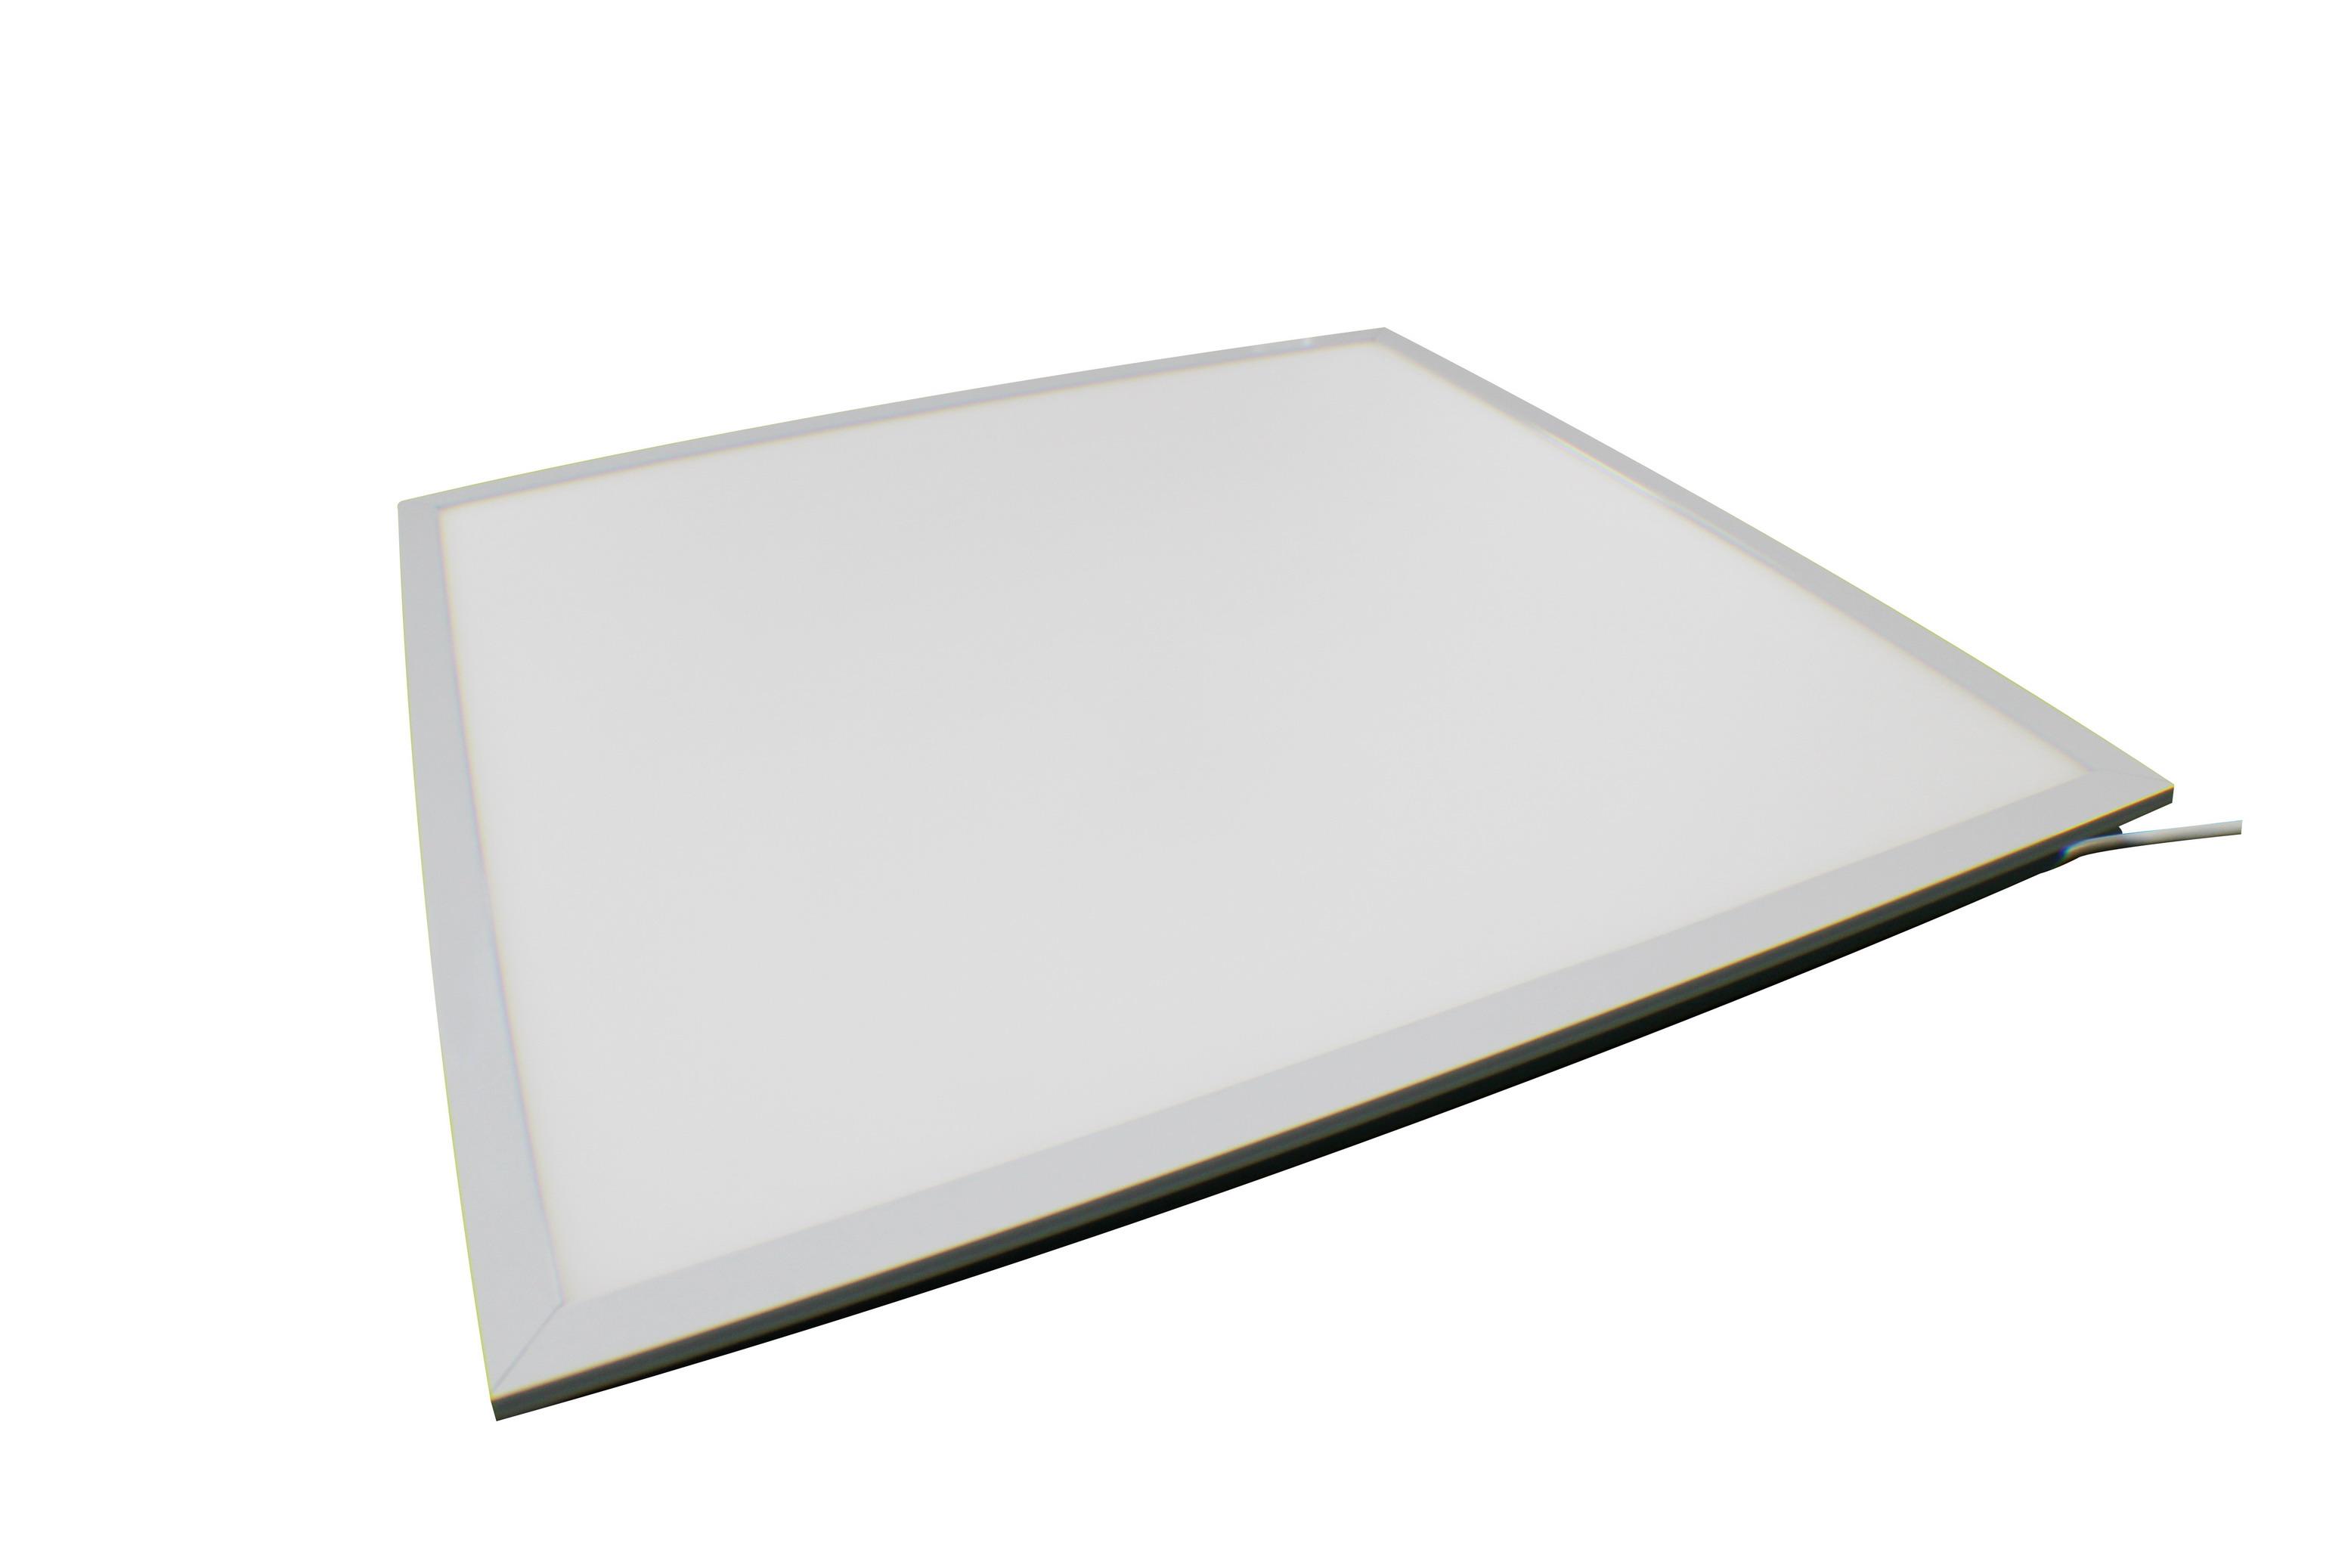 led panel light 36w 600600 slim flat office light